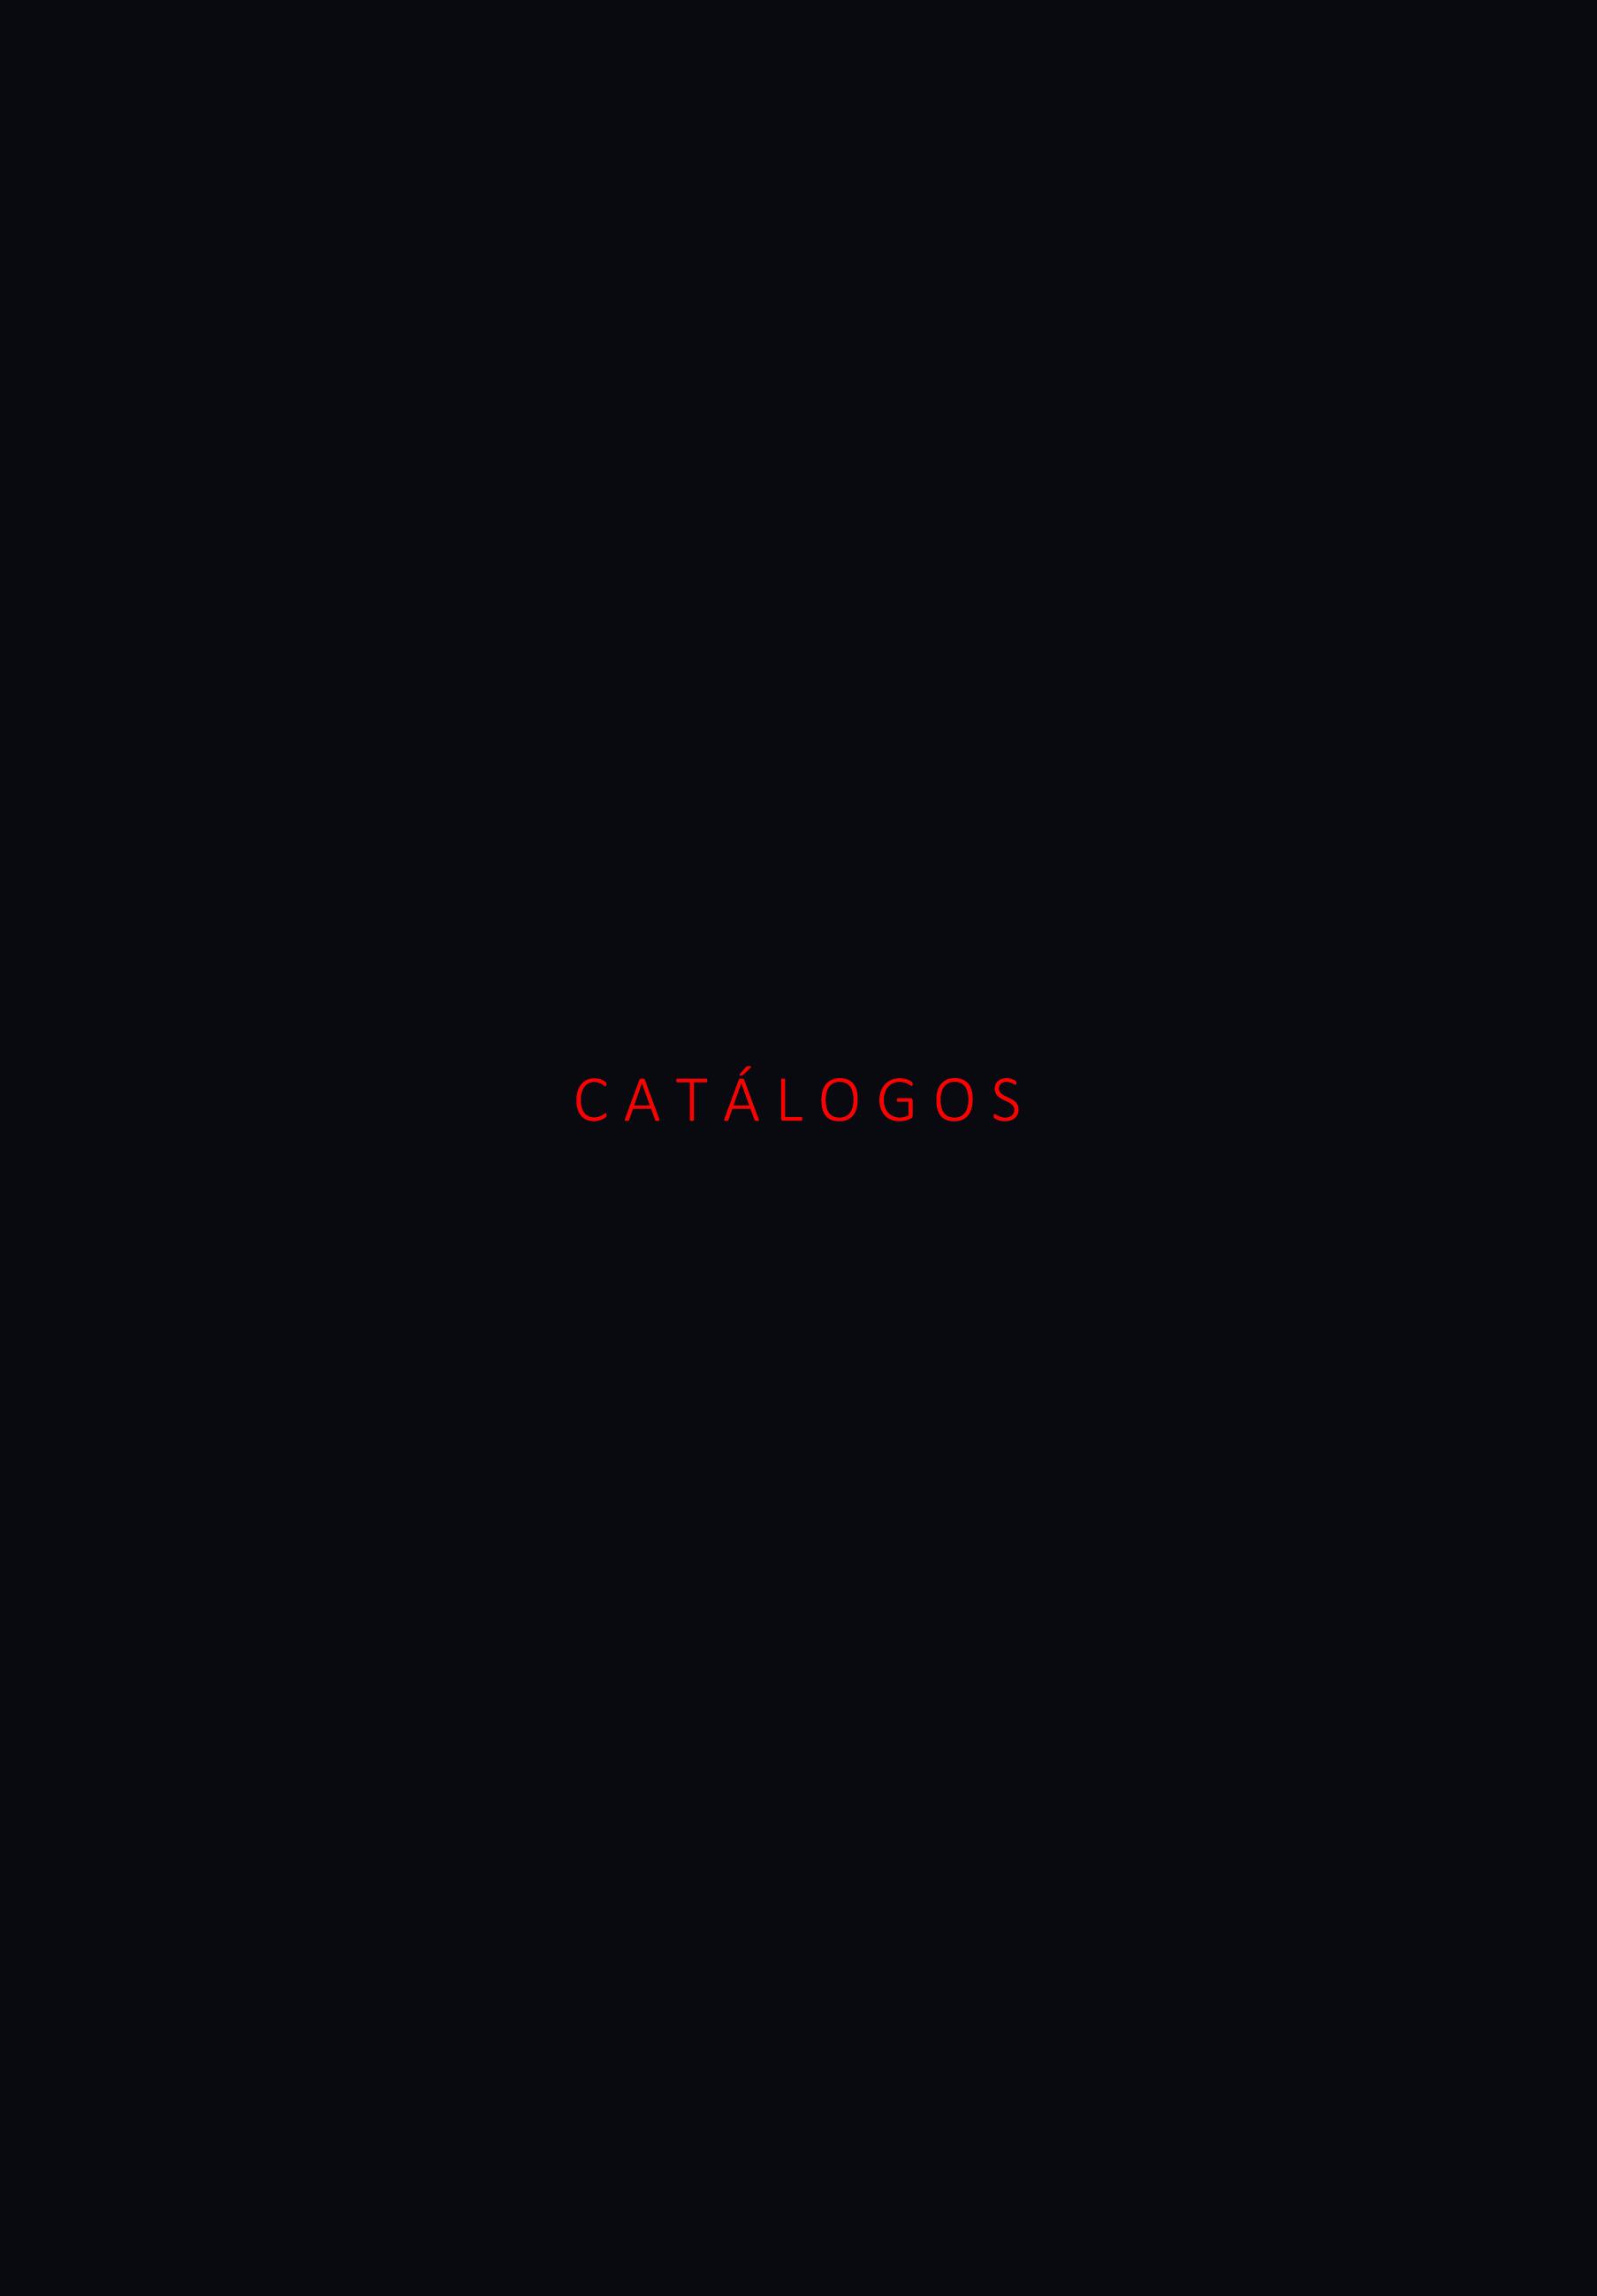 CATÁLOGOS__CAPA.jpg